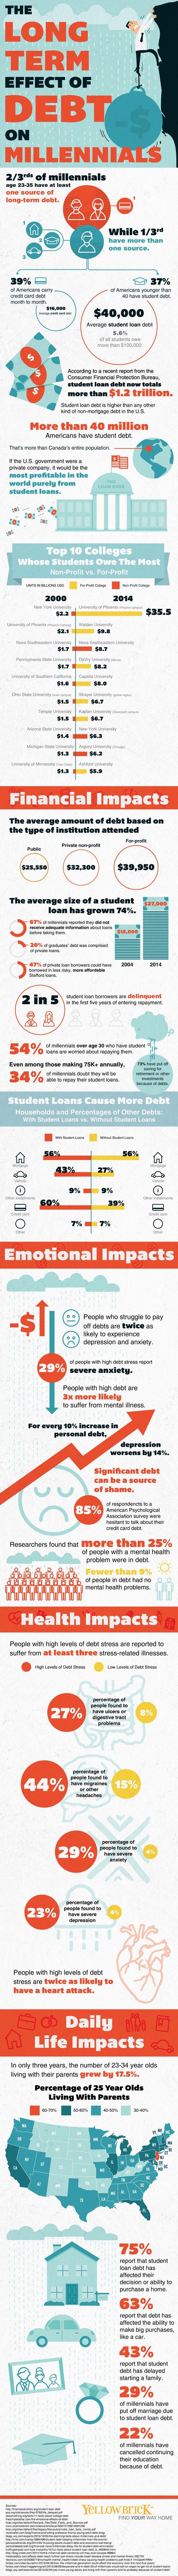 Psychology-Infographic-millennials-in-debt Psychology Infographic : millennials in debt